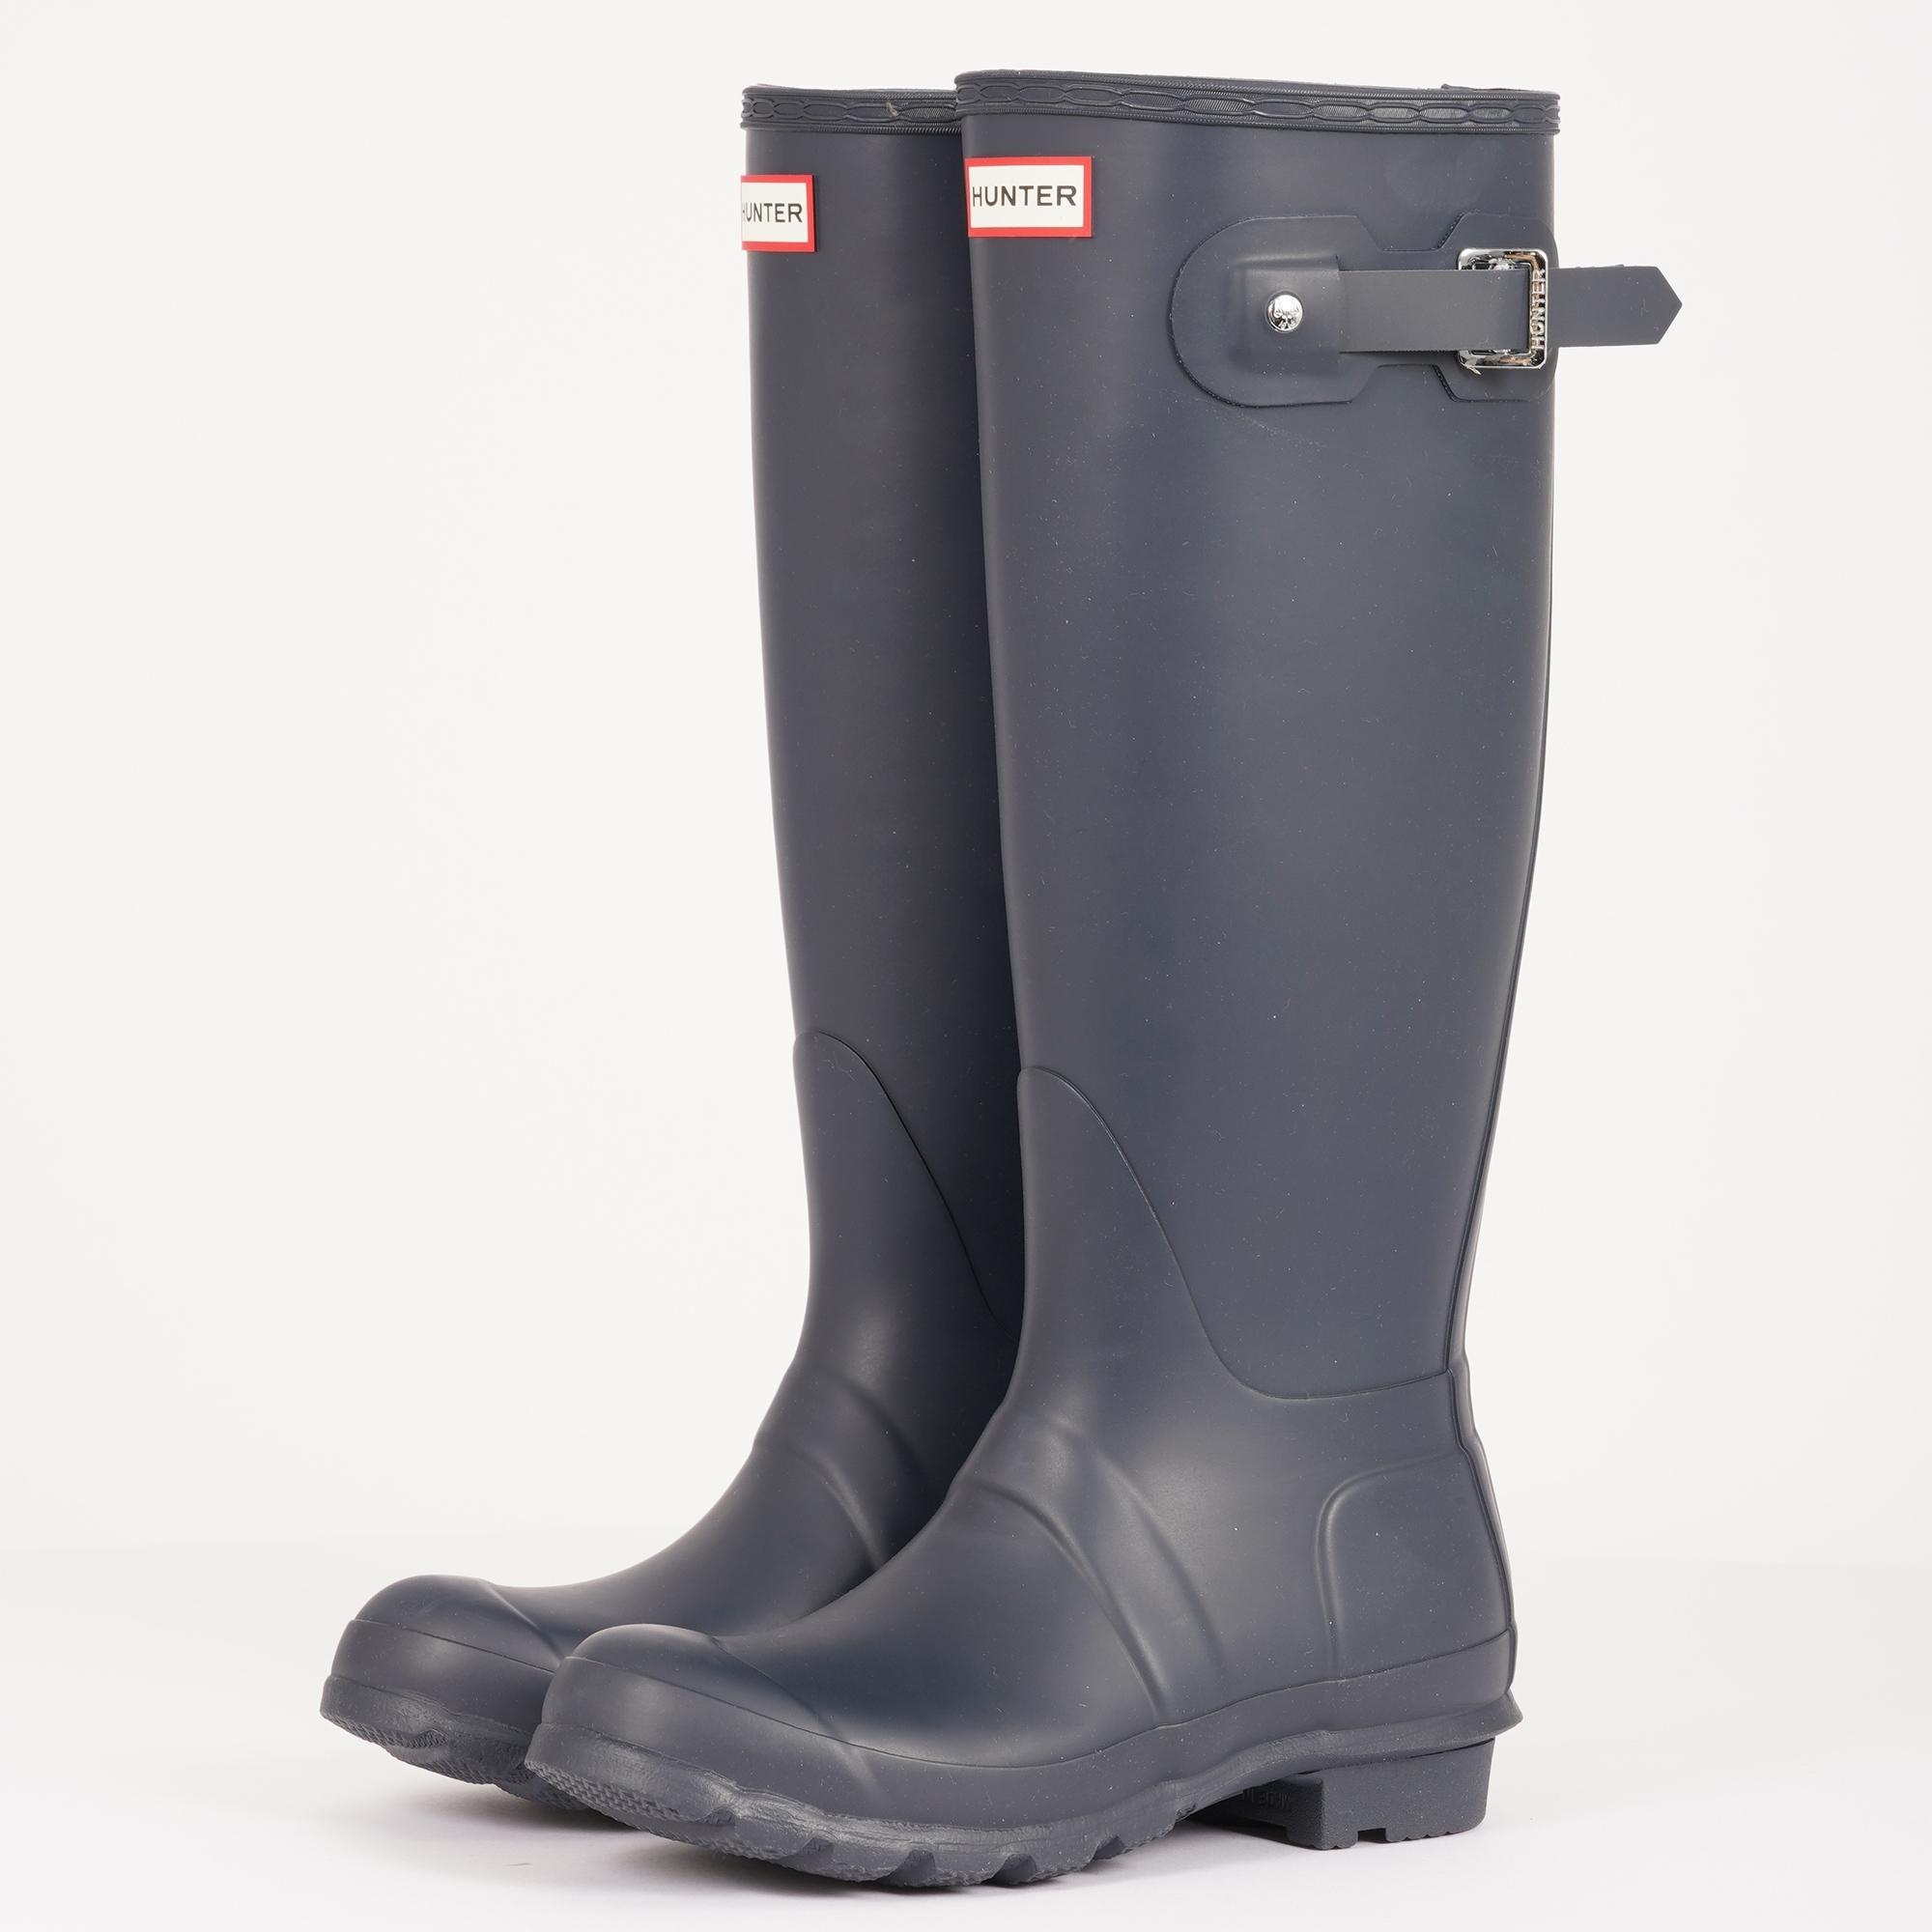 a180ef10302 Hunter Womens Original Tall Wellington Boots